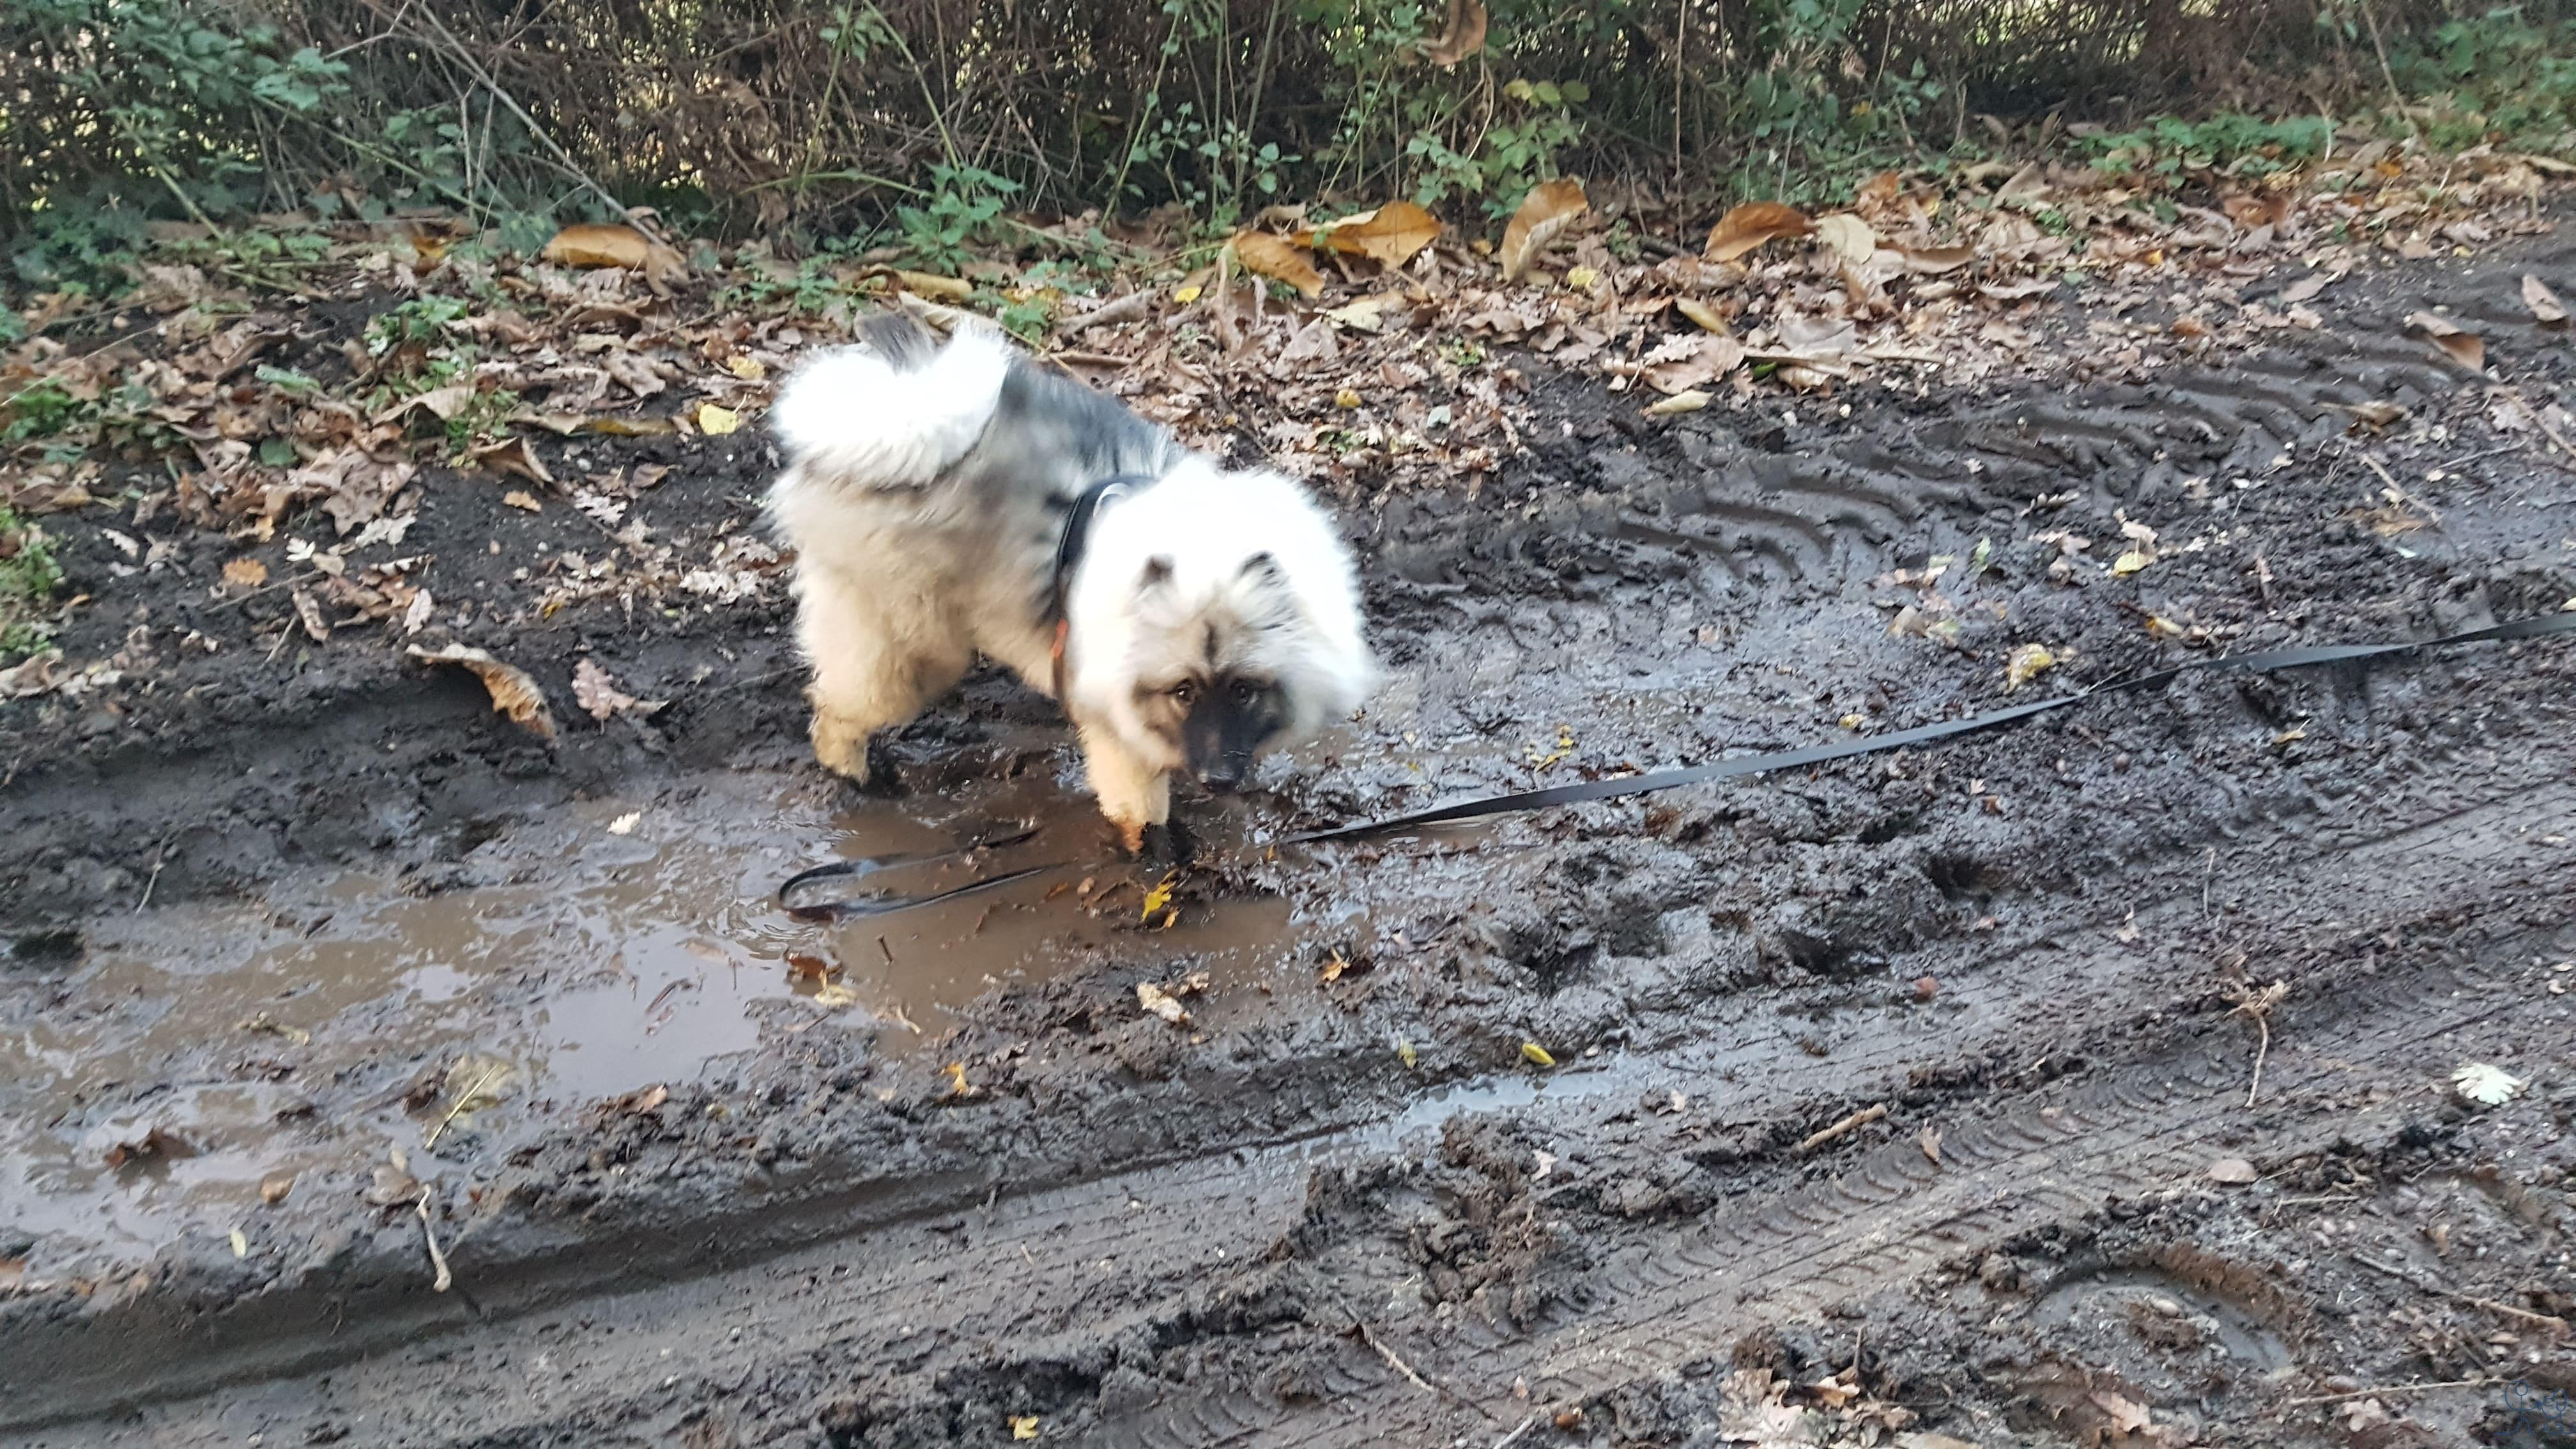 Naya prend des bains de boue!